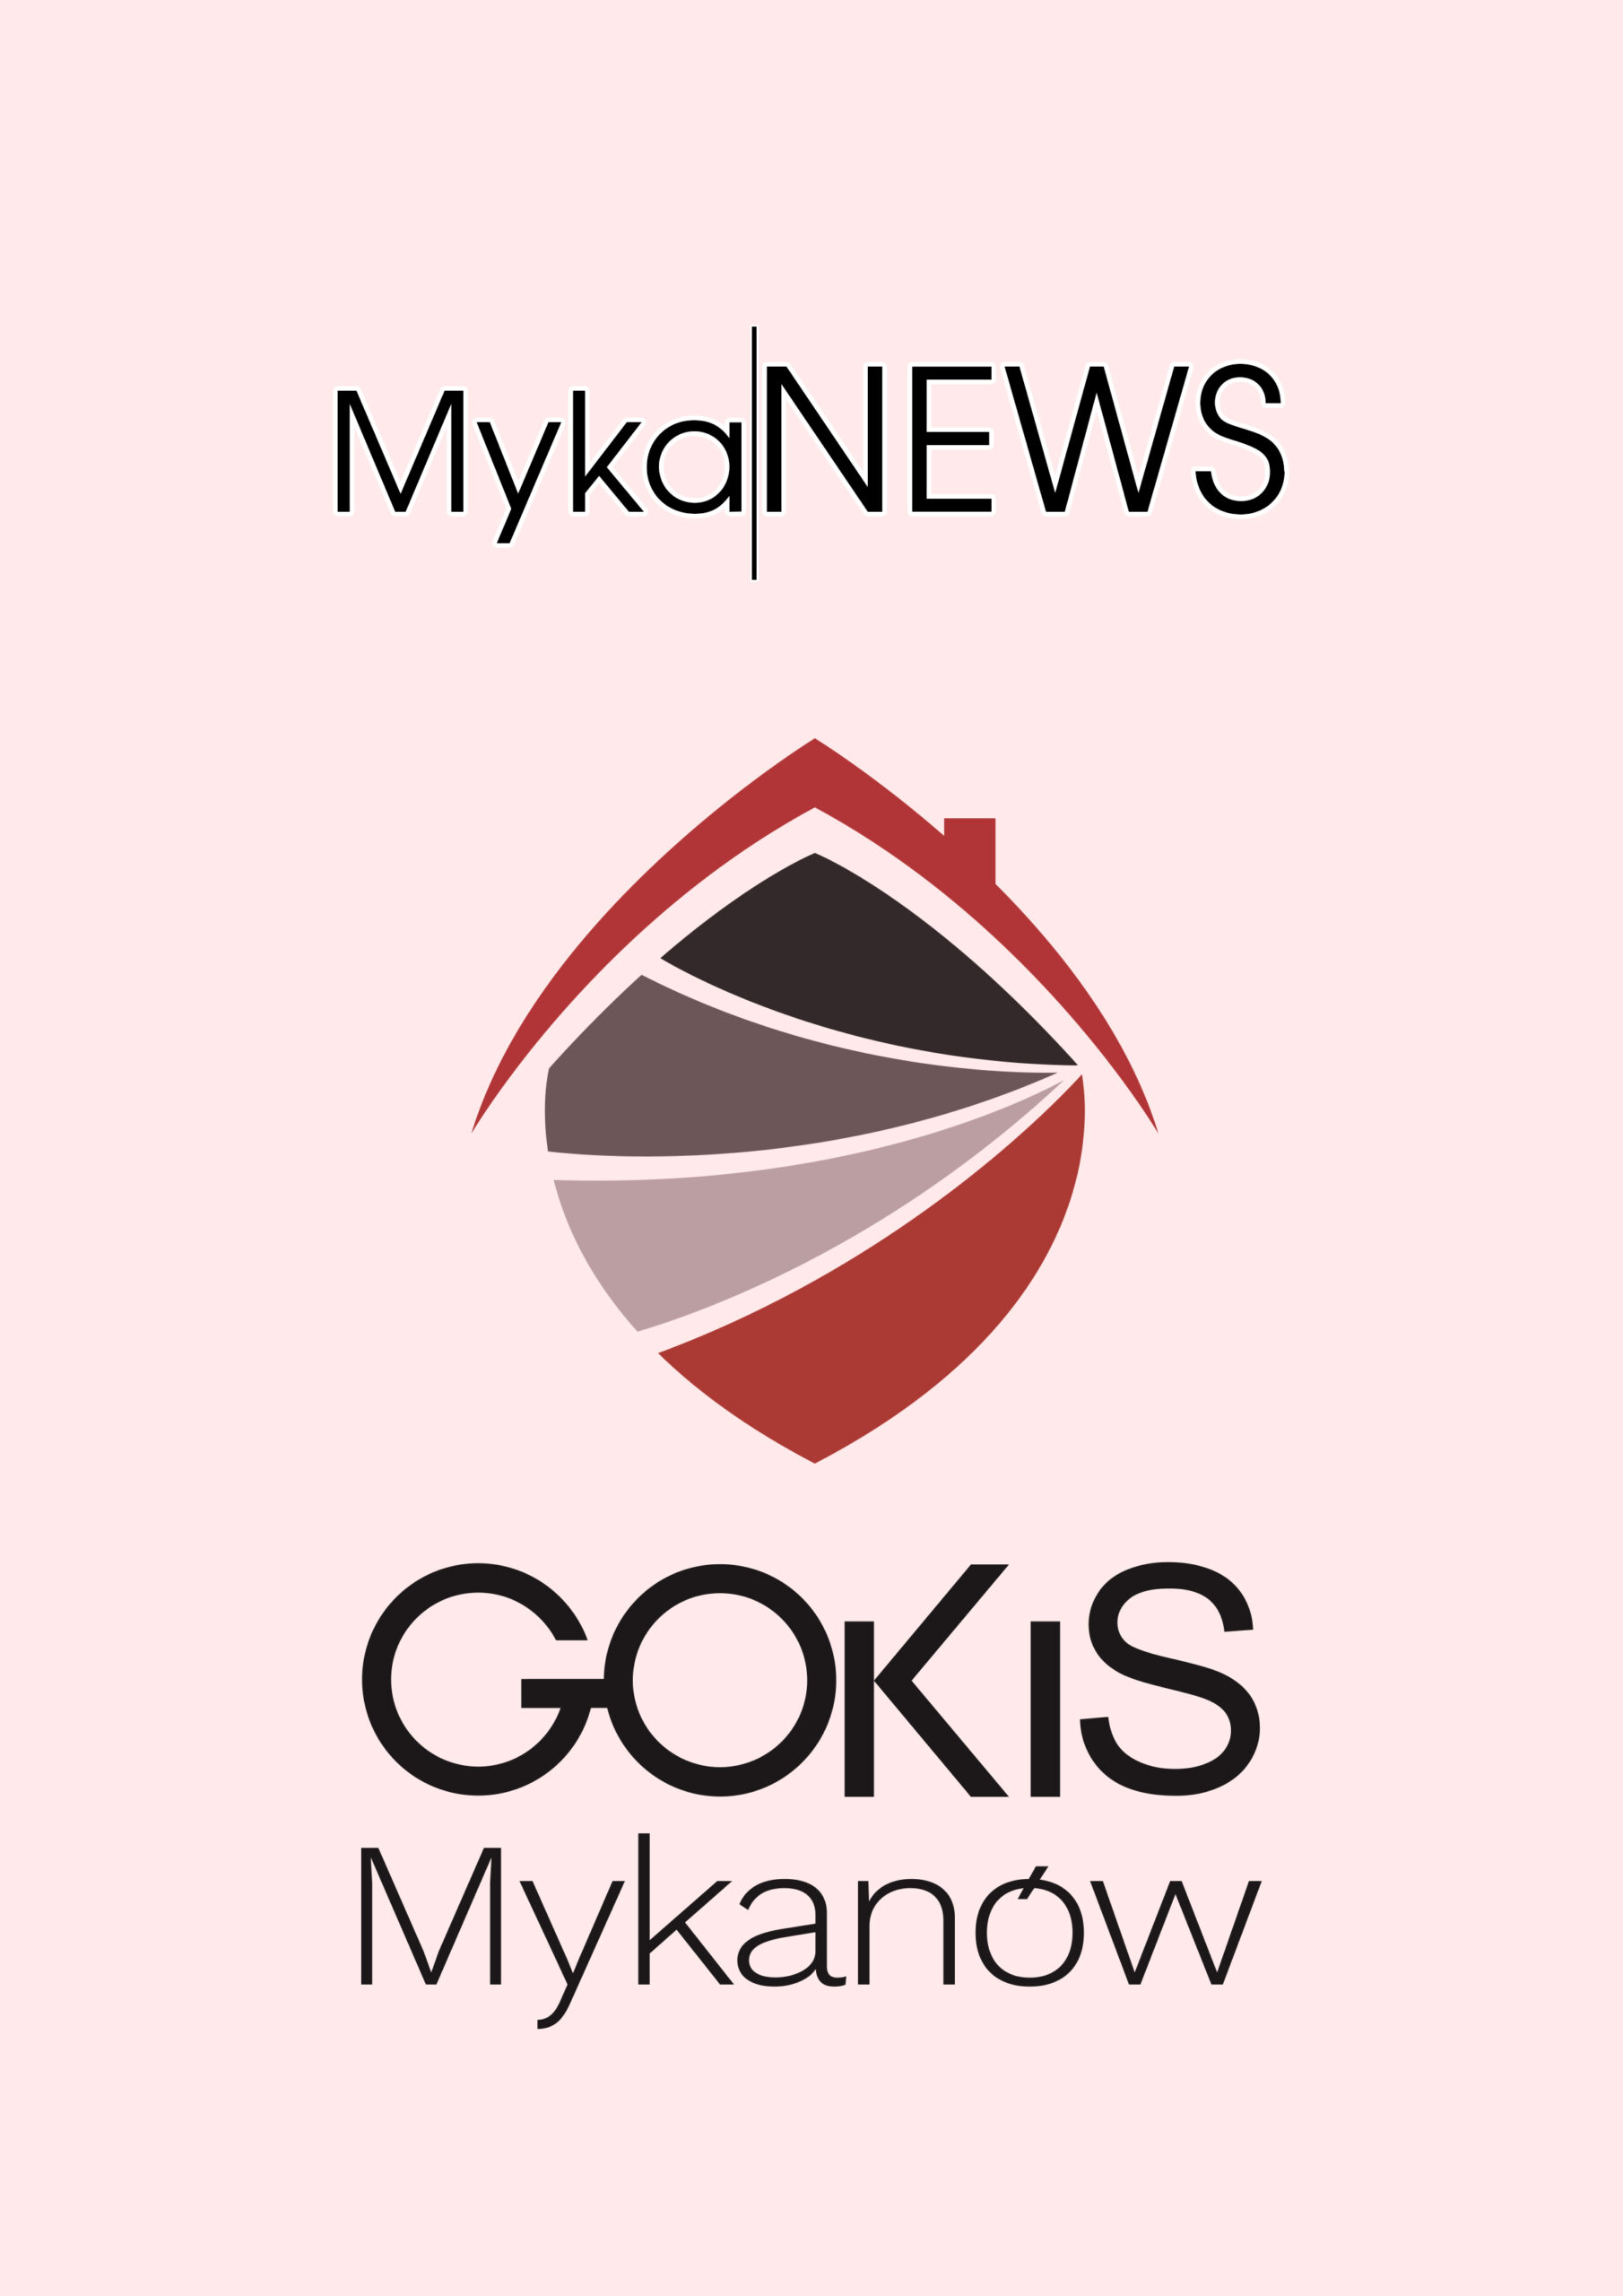 MykaNEWS – Na Skrzyżowaniu Kultur